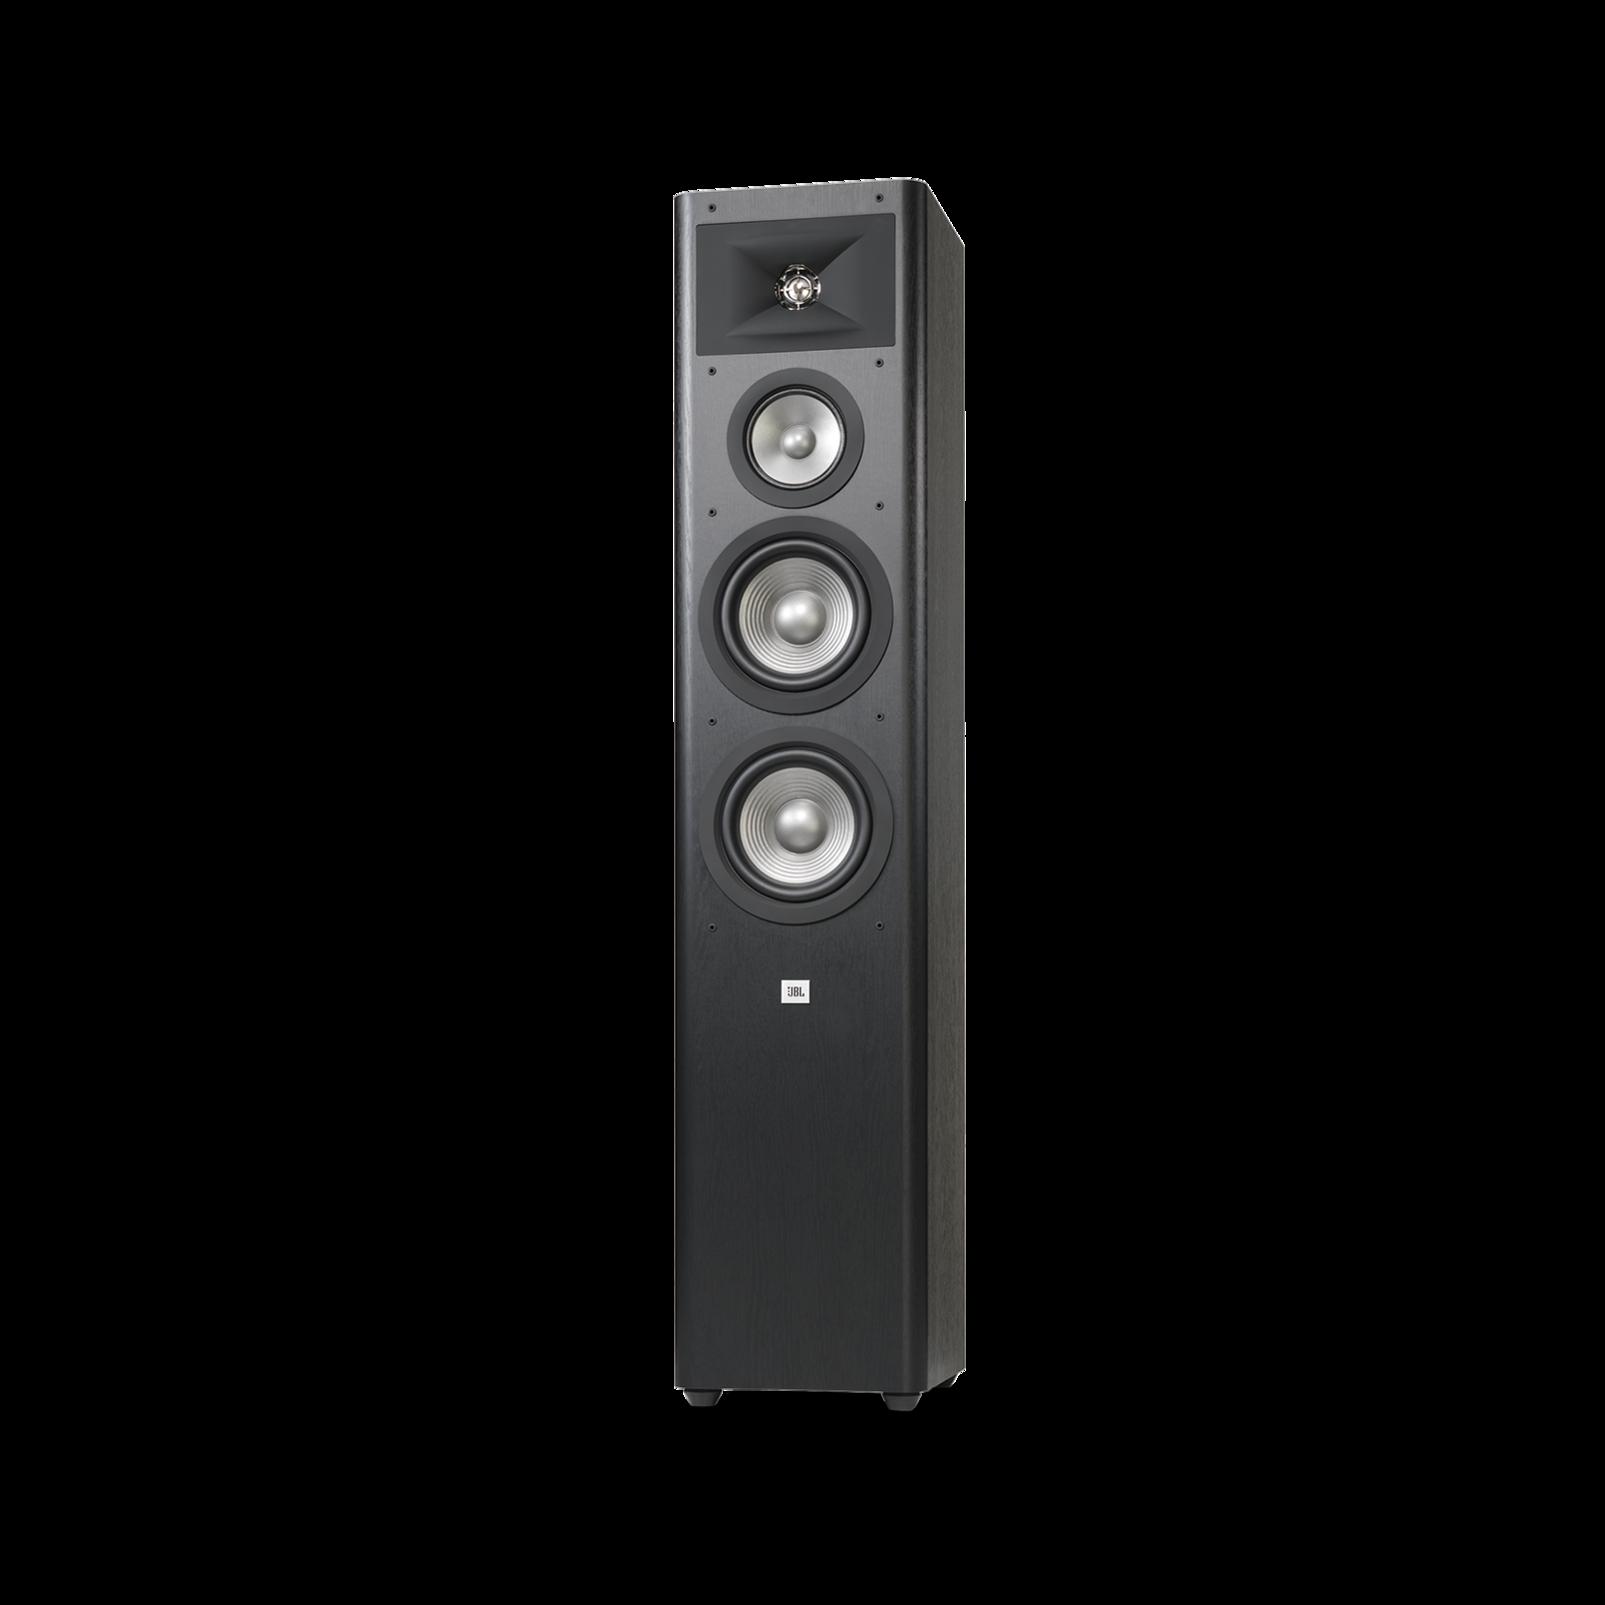 Studio 280 High Quality 3 Way Dual 65 Inch Floorstanding Speaker Av Receivers Datasheet For Home Theater Product Solution